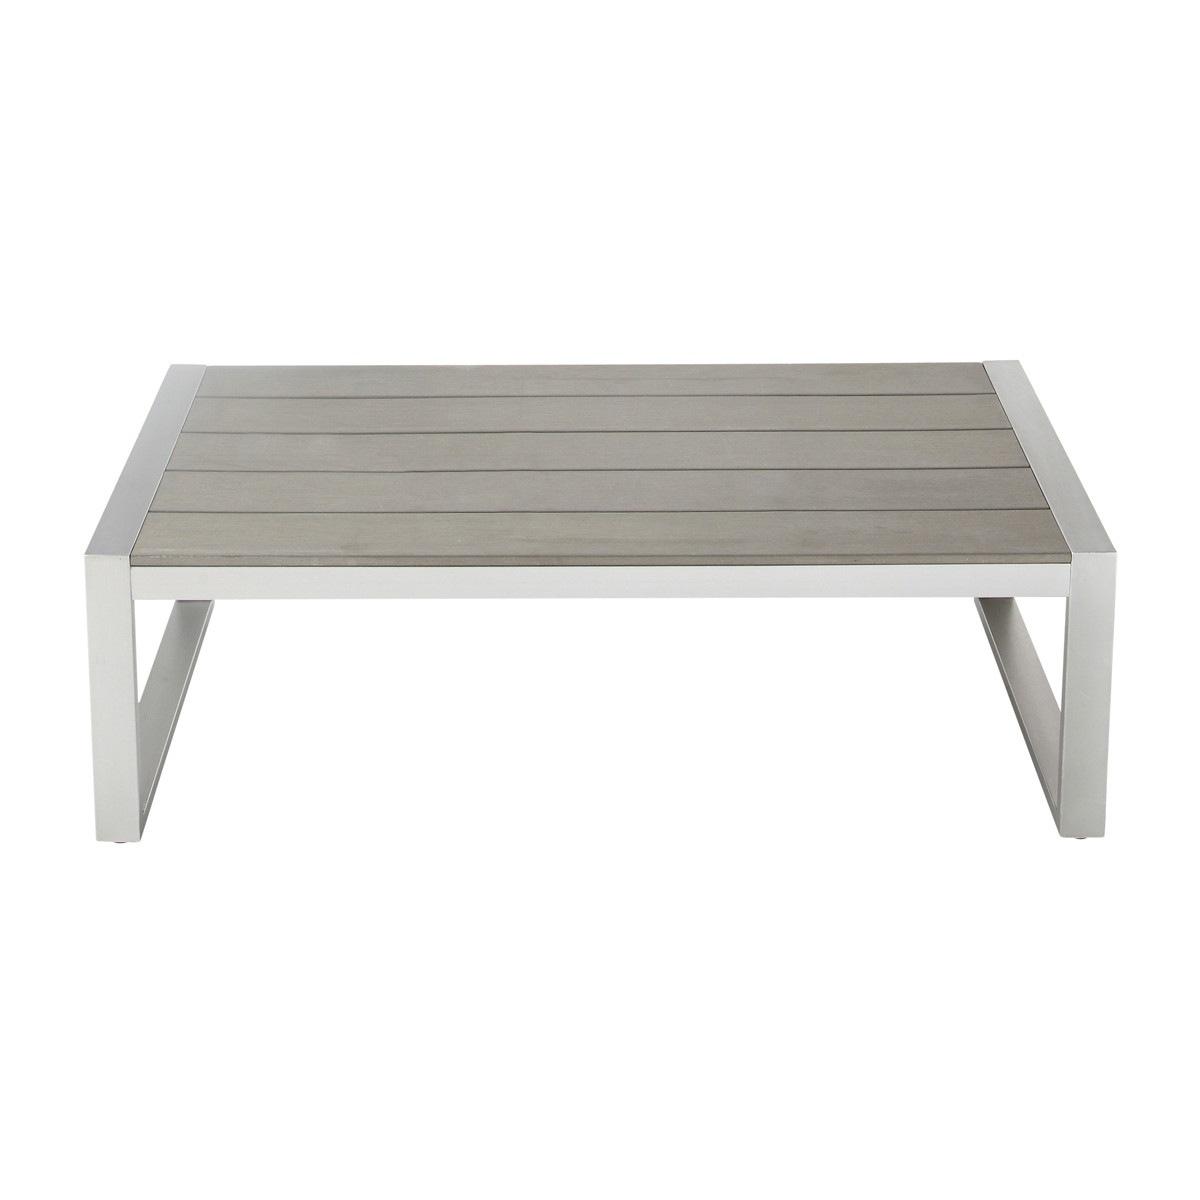 Petite Table Ronde Pliante Luxe Galerie Petite Table Pliable élégant Table Ronde Pliable Table Et Chaise